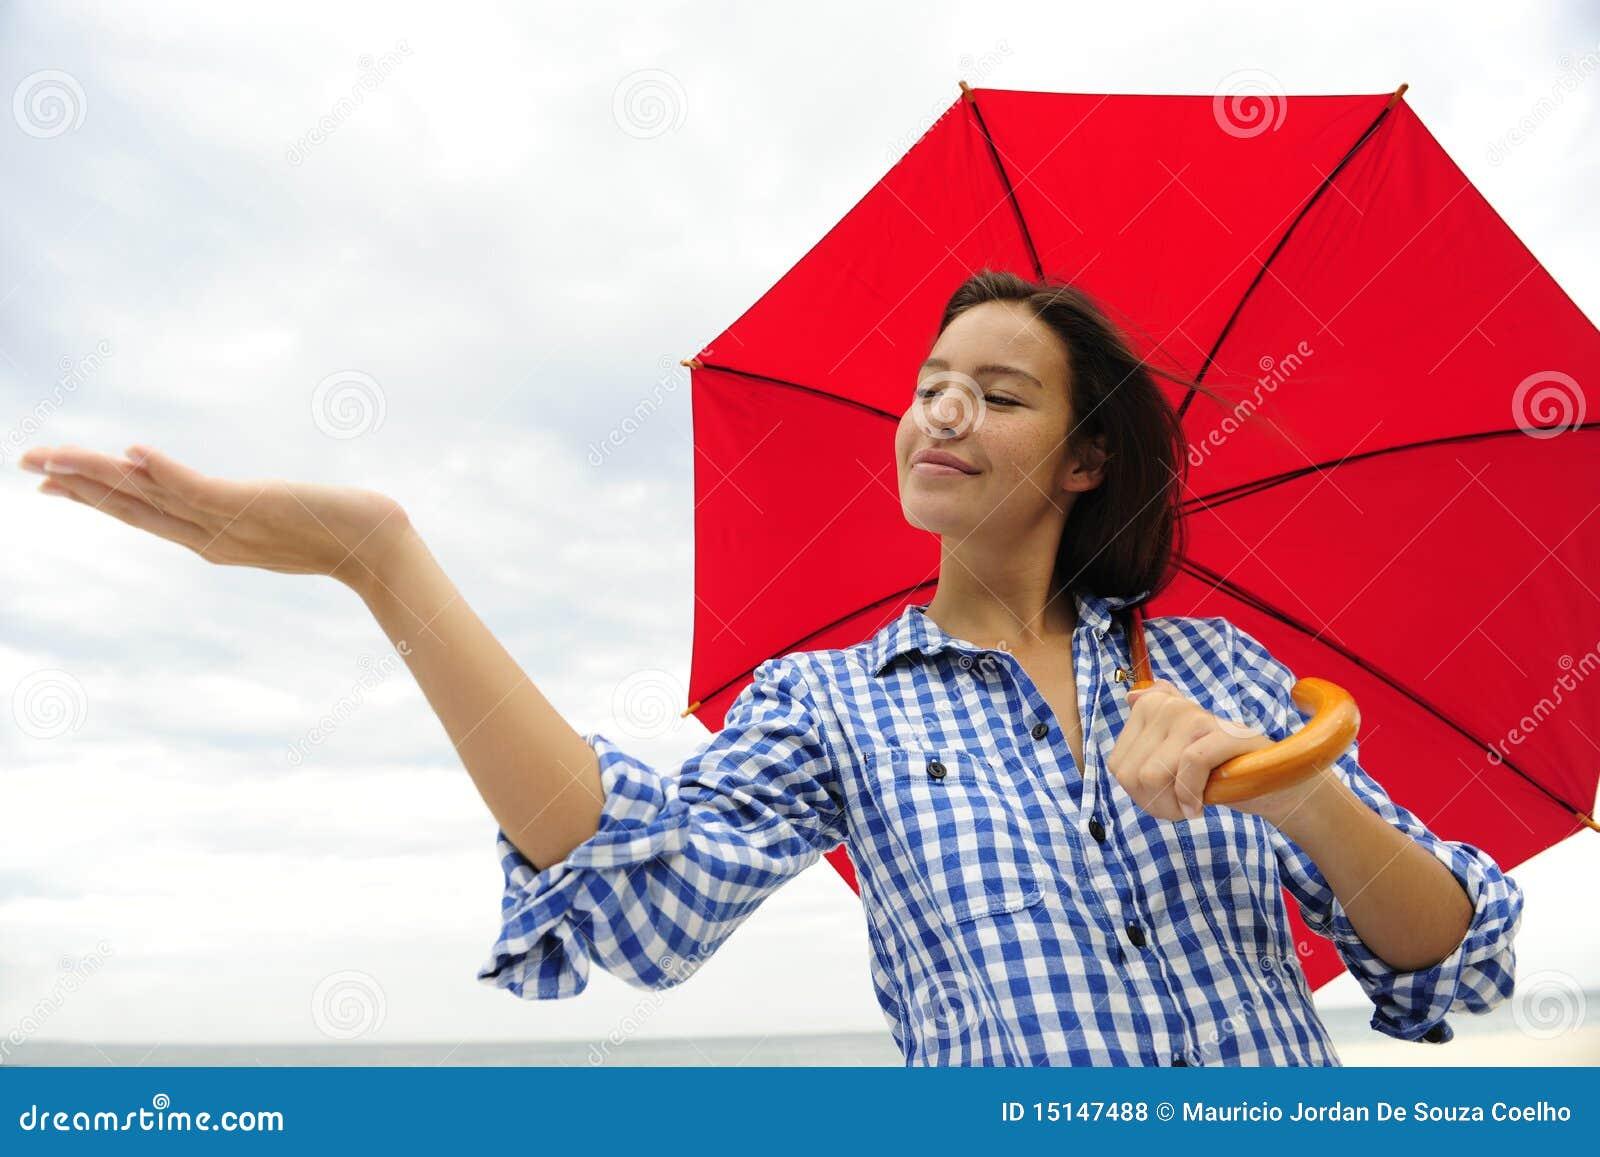 Frau mit dem roten Regenschirm, der den Regen berührt